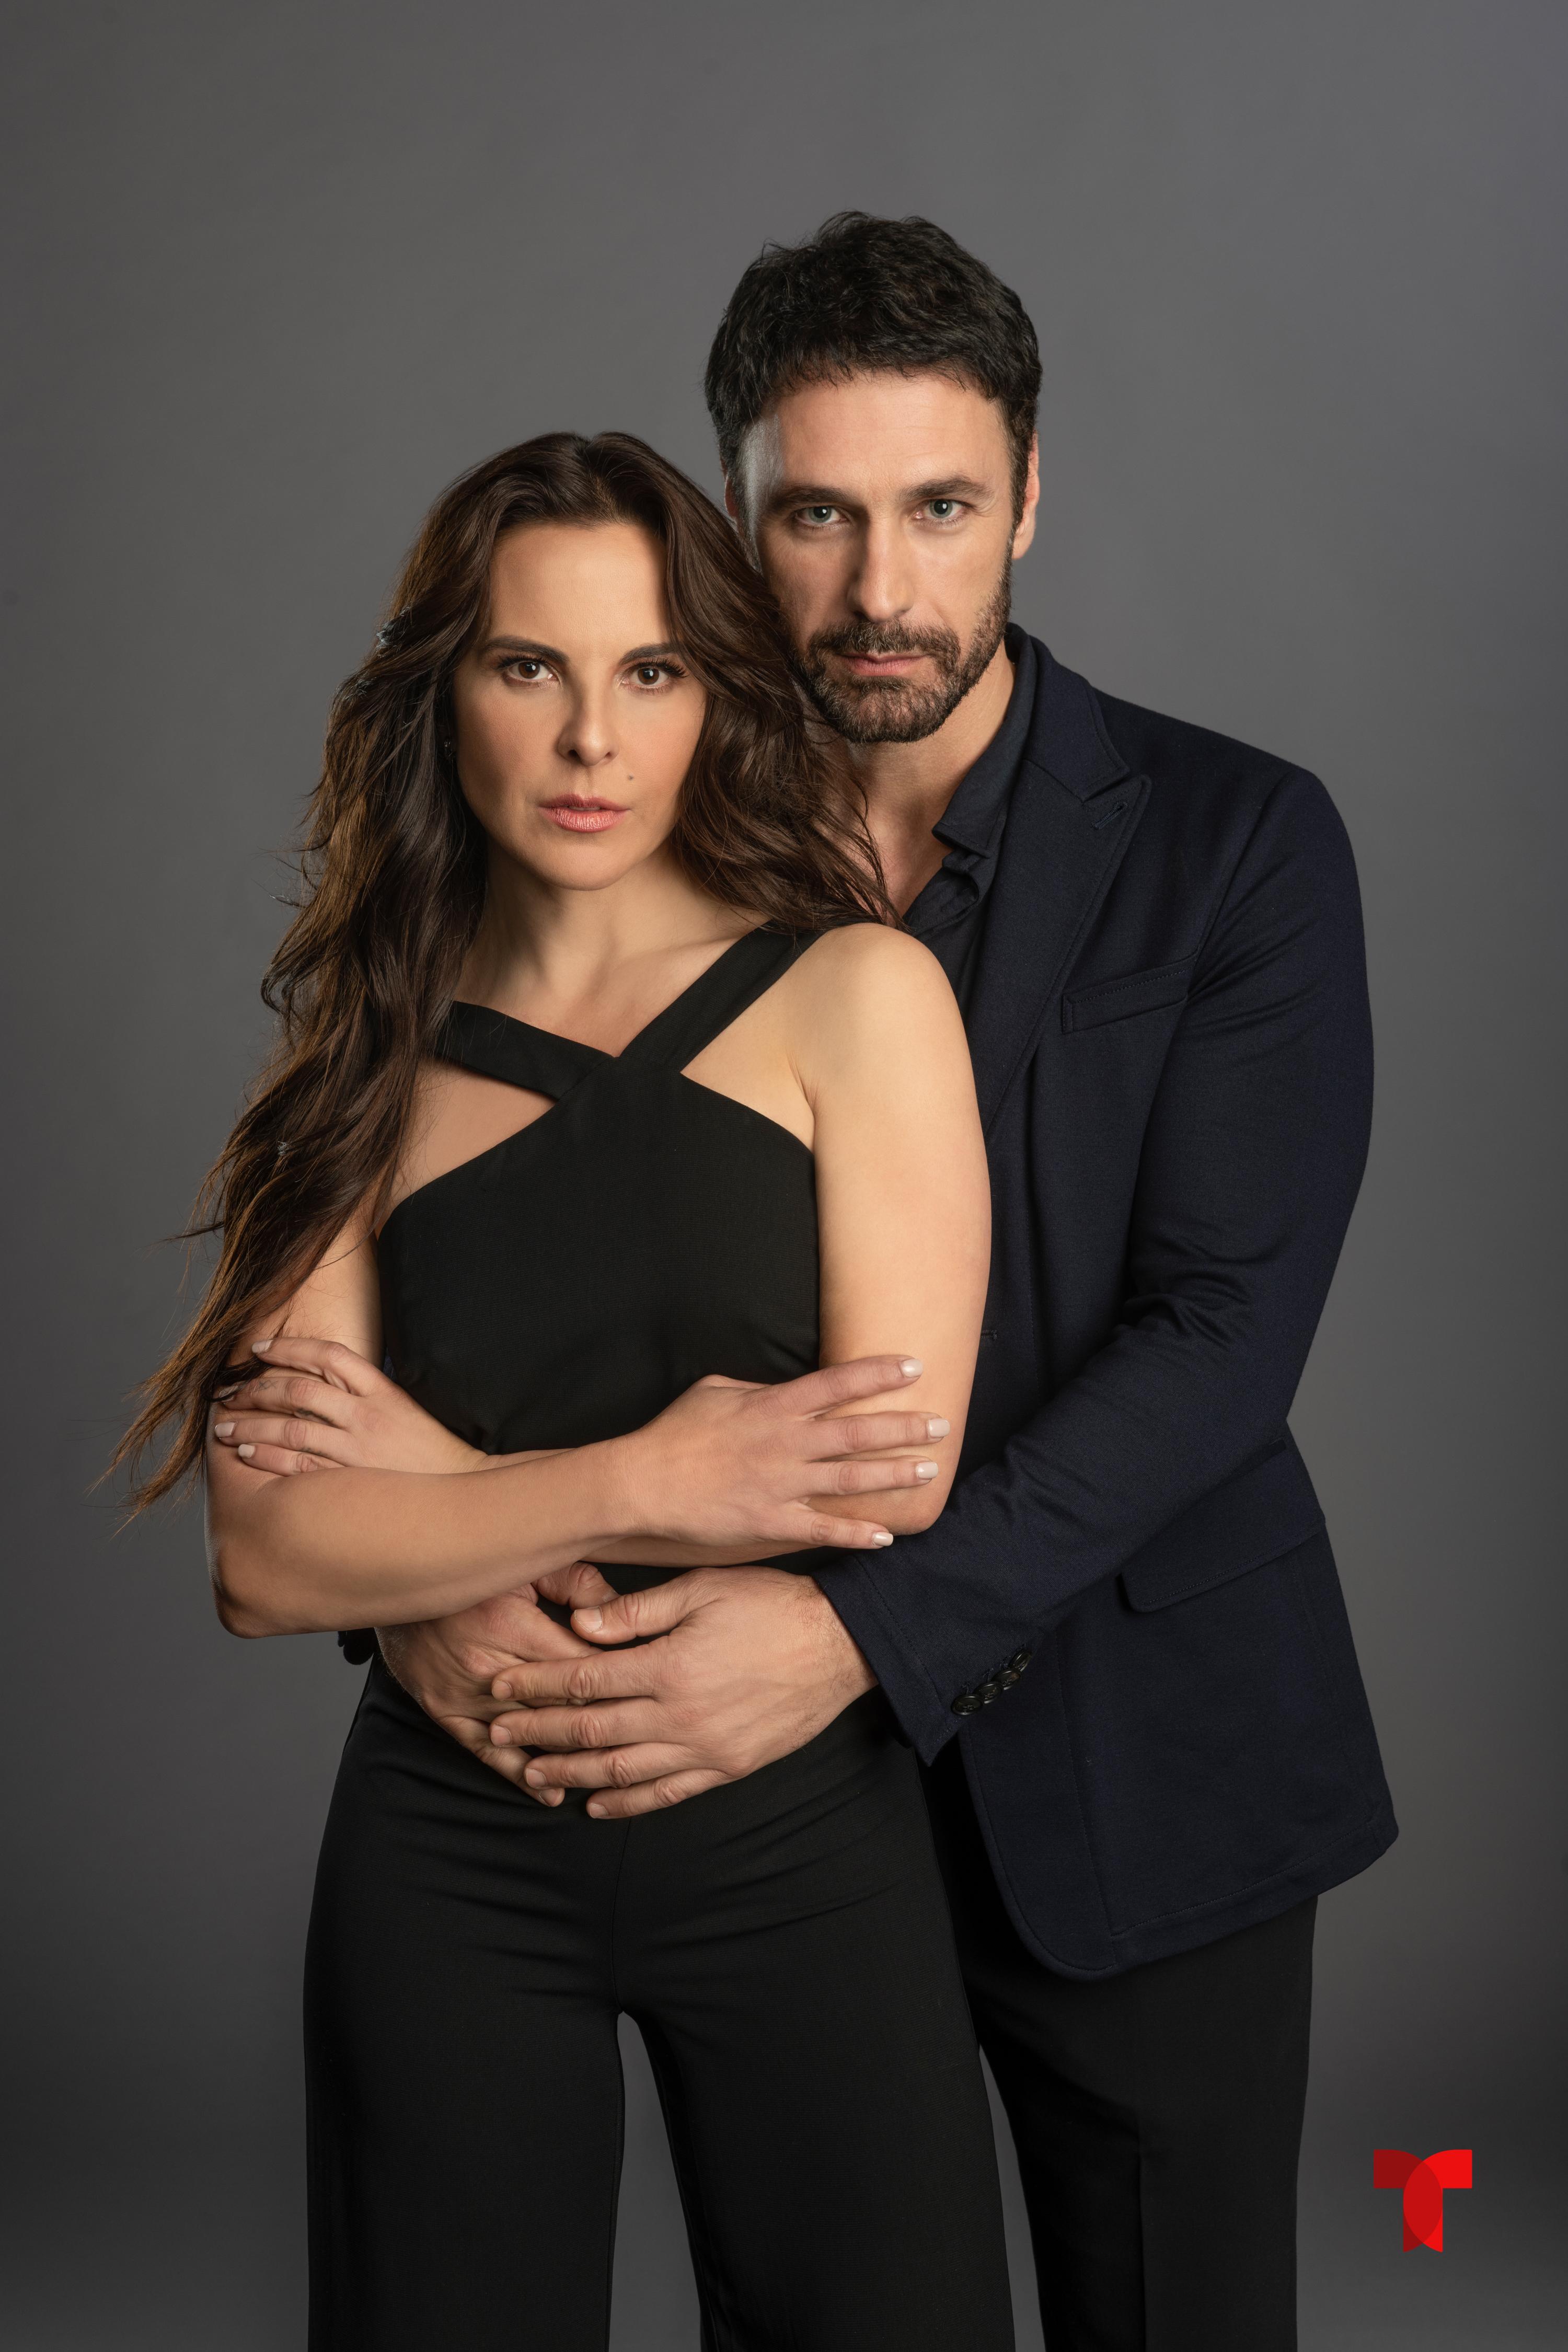 LRDS2_Kate del Castillo como Teresa Mendoza y Raoul Bova como Francesco Belmondo_002 copia